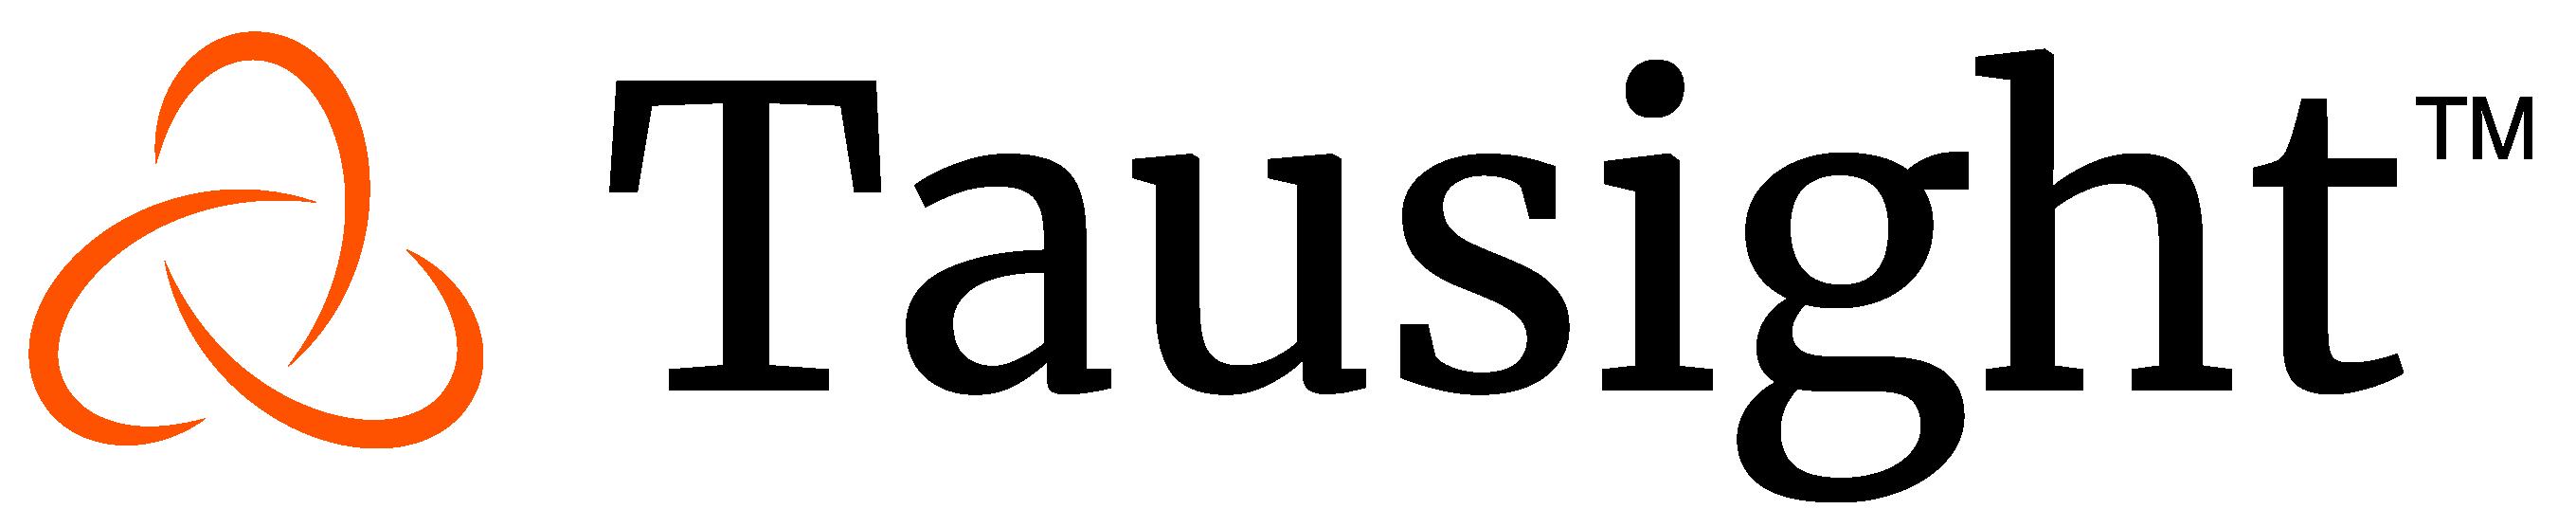 Tausight logo